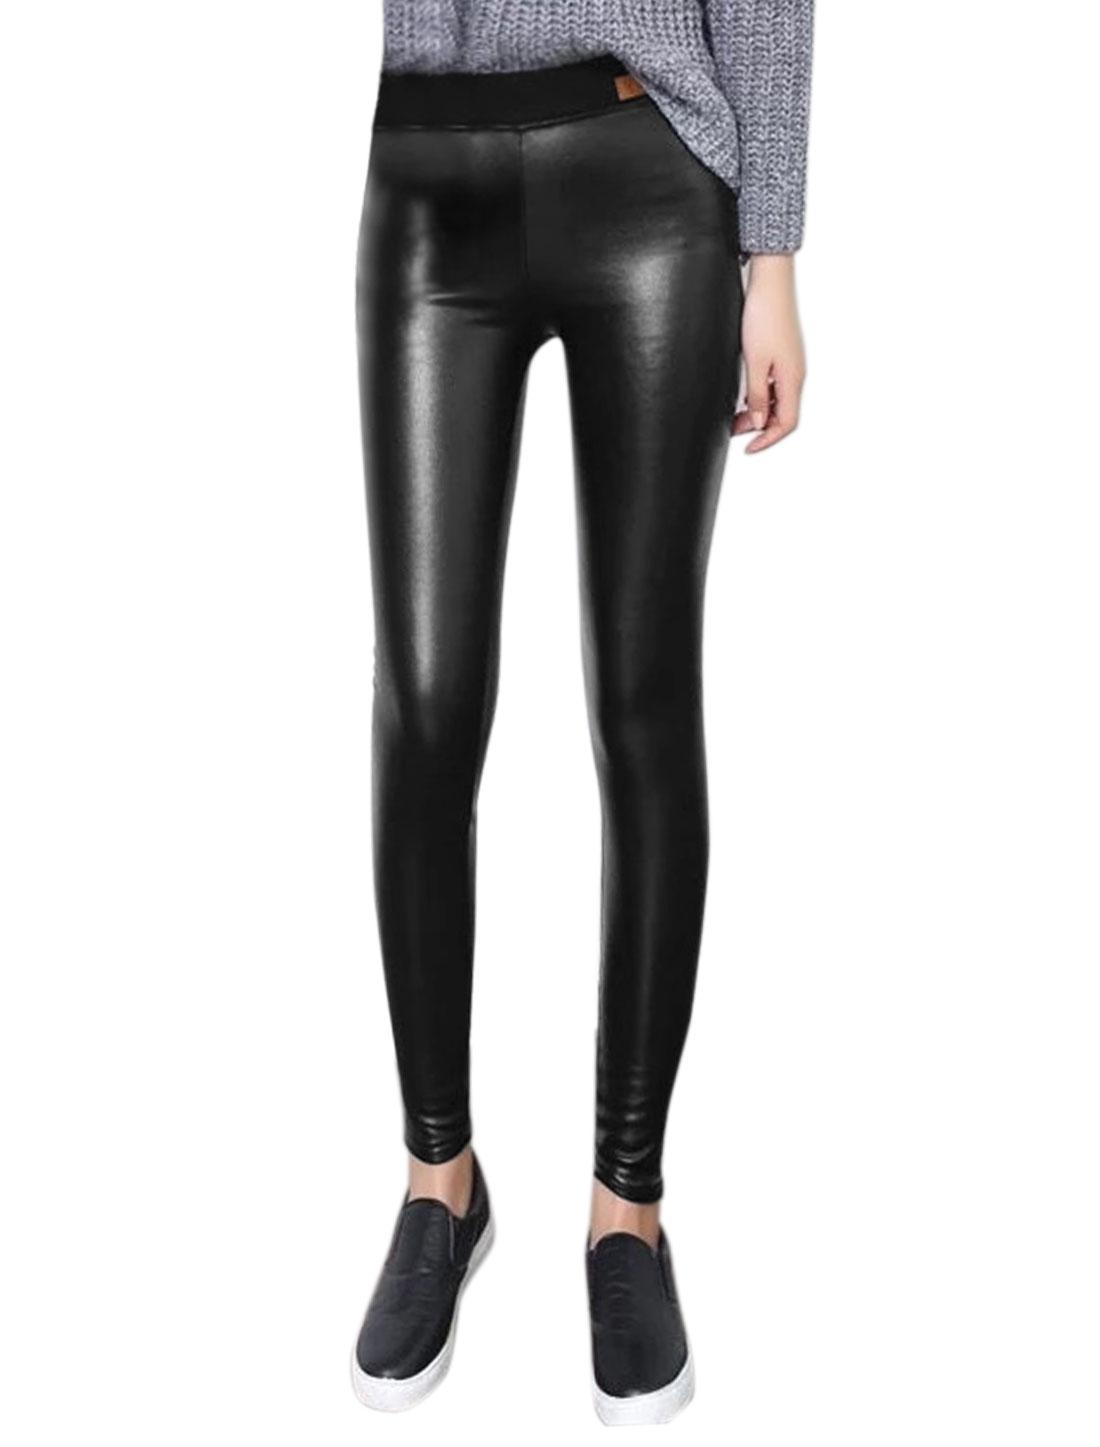 Women Elastic Waist Footless Shiny Skinny PU Leggings Black XS